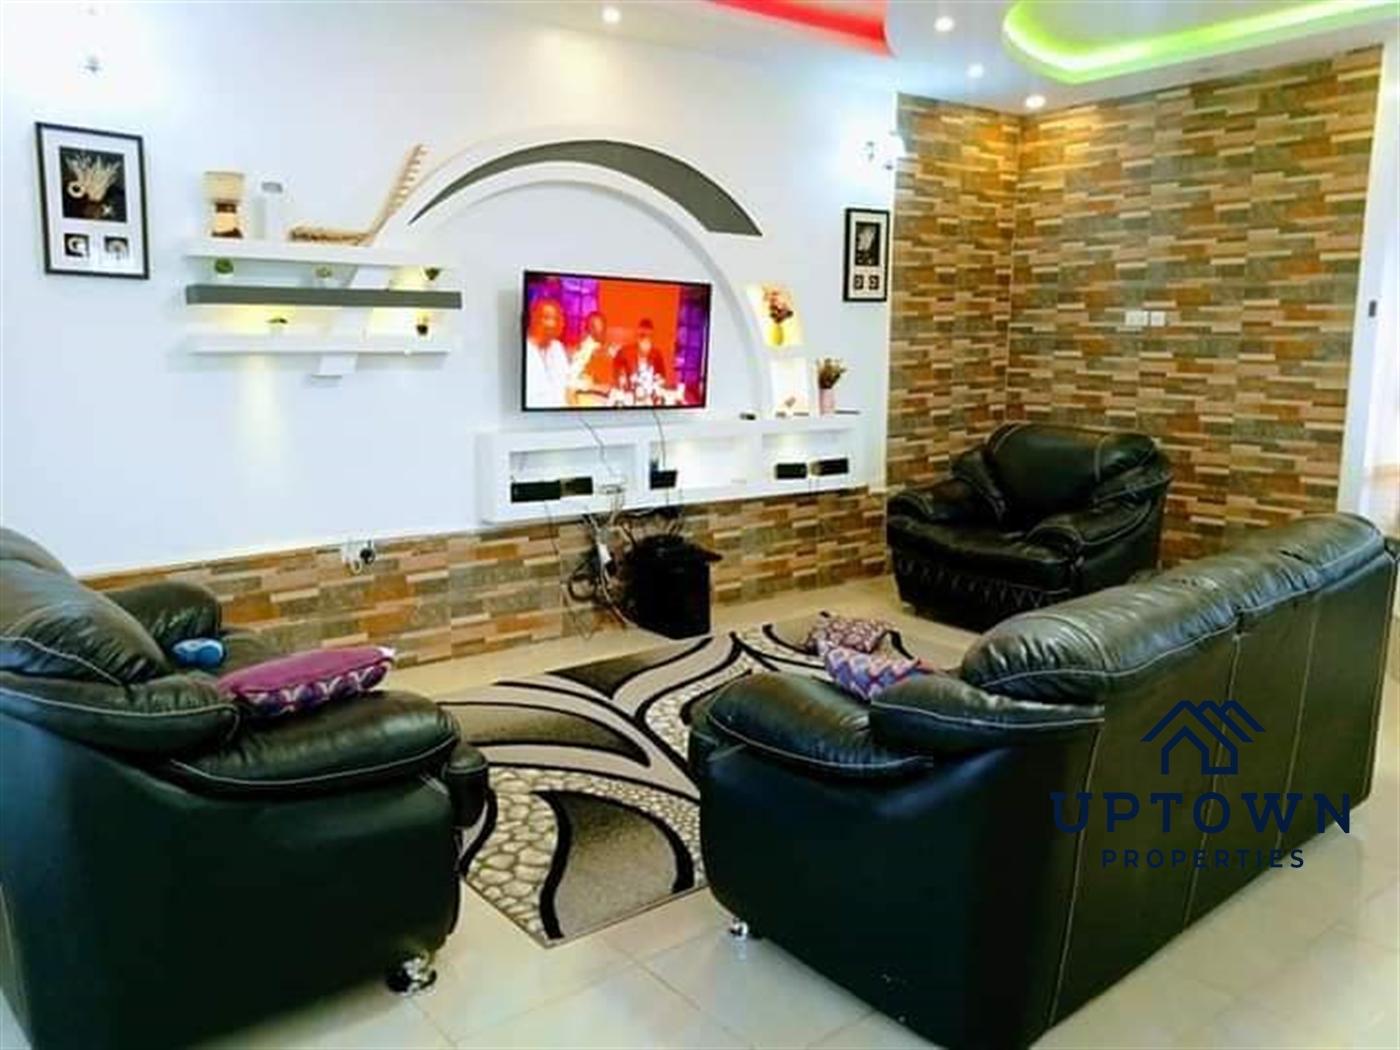 Storeyed house for sale in Bwebajja Wakiso